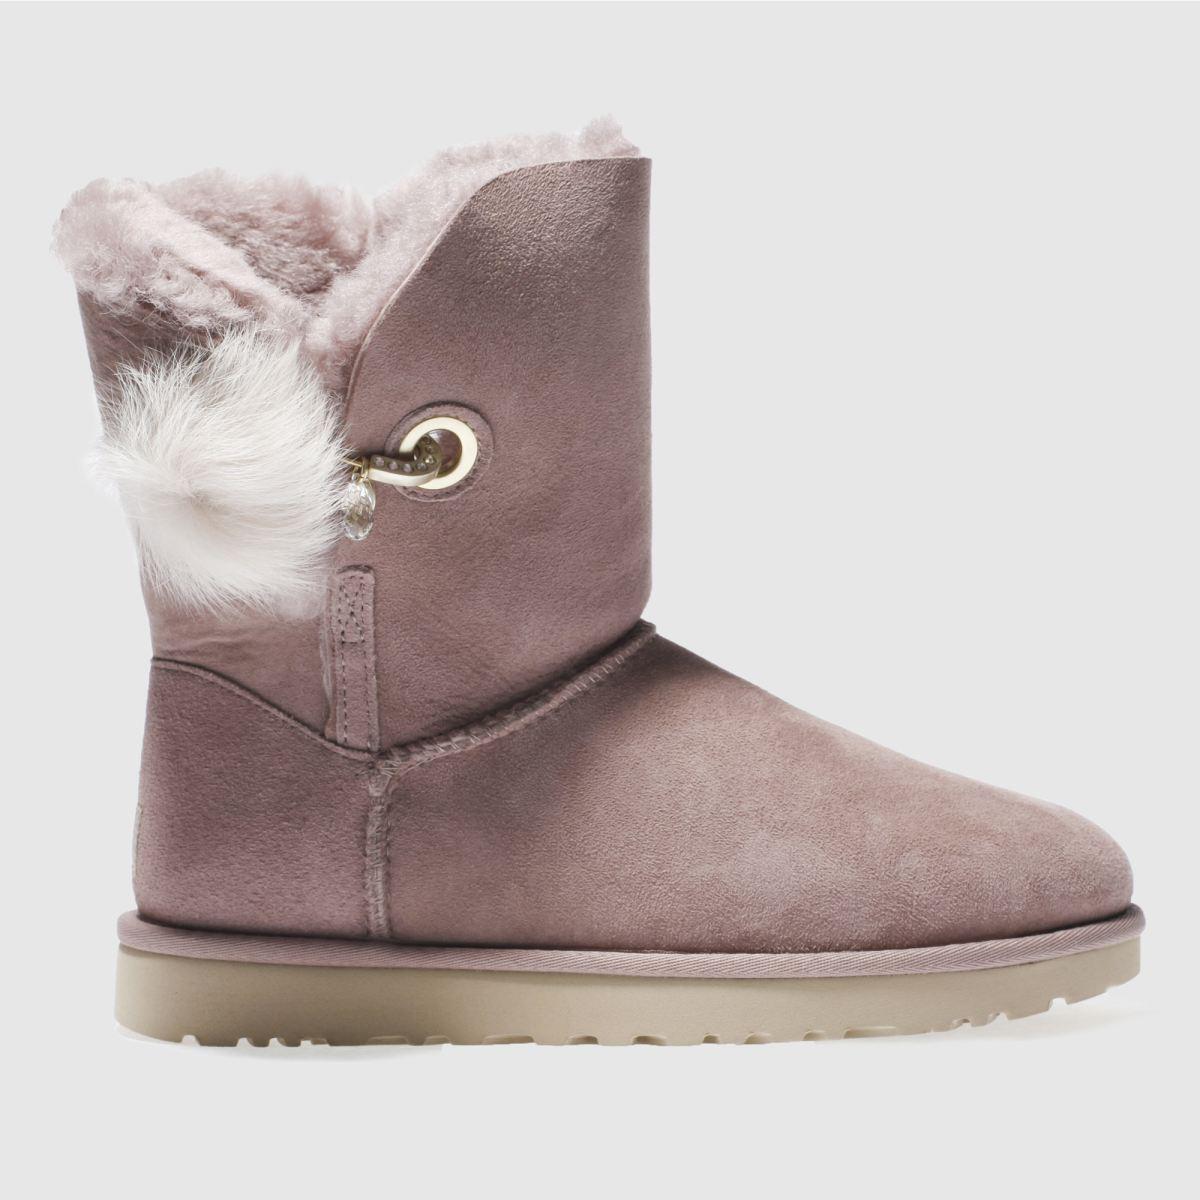 Ugg Pale Pink Irina Boots